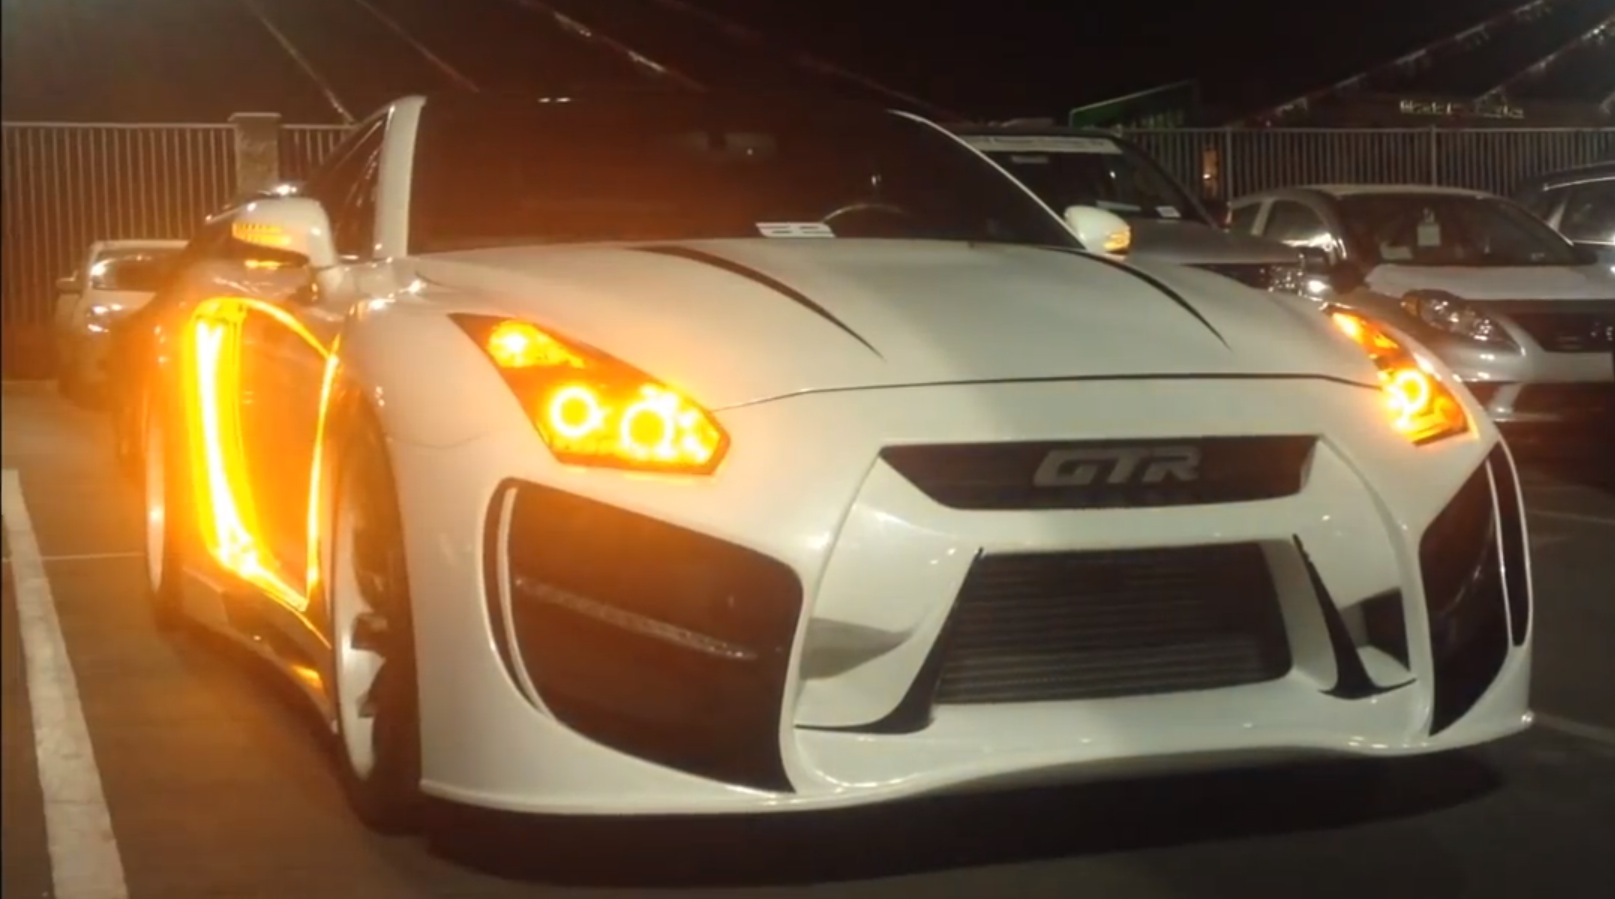 Radzilla Widebody Nissan Gt R With An Amazing Light Show